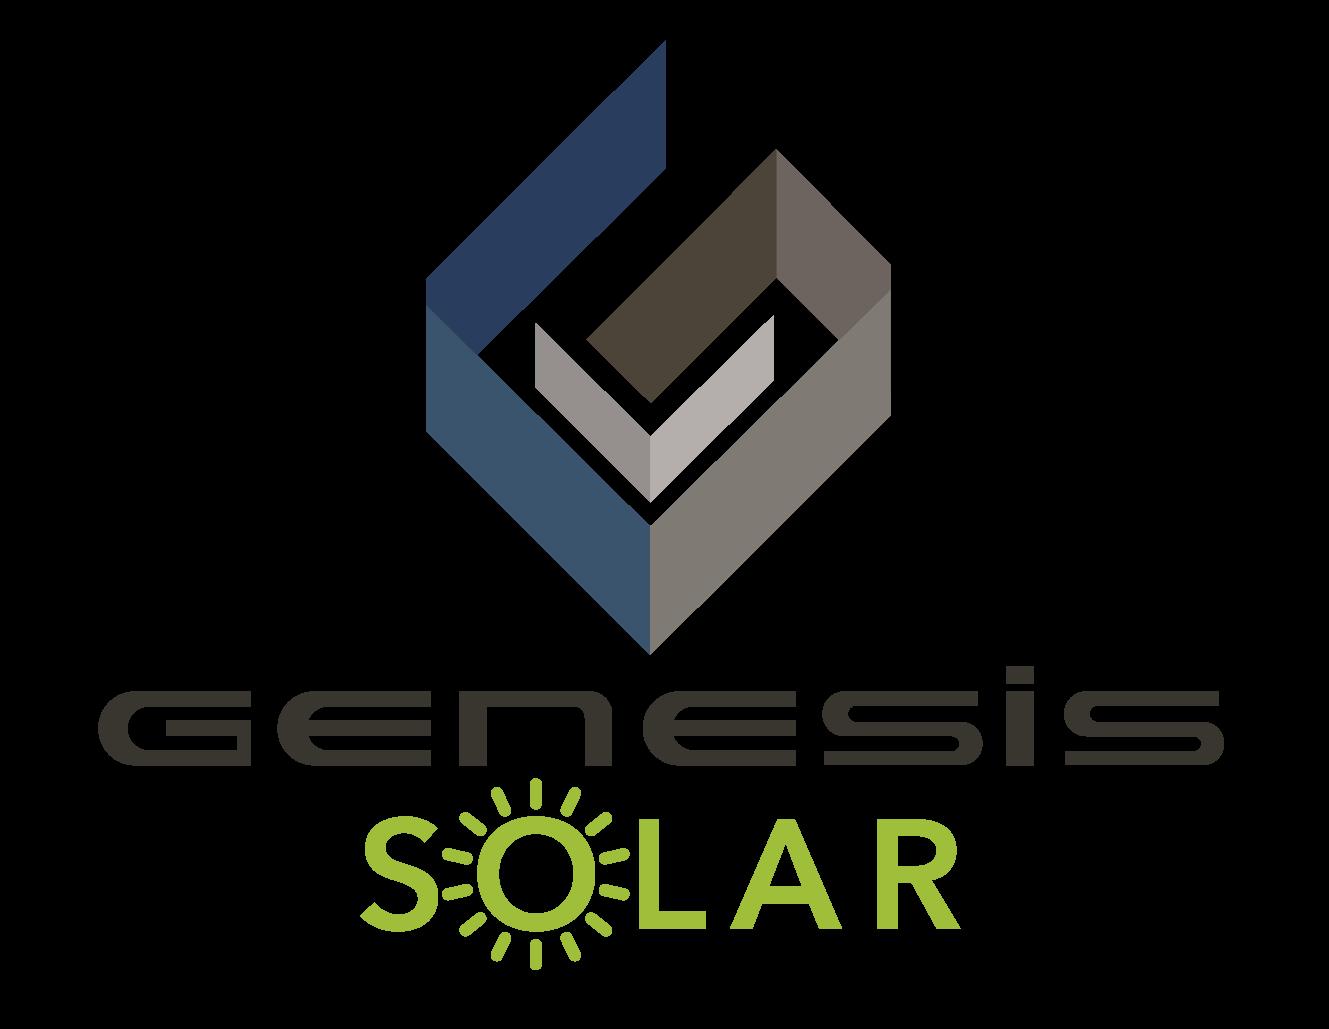 Genesis Solar